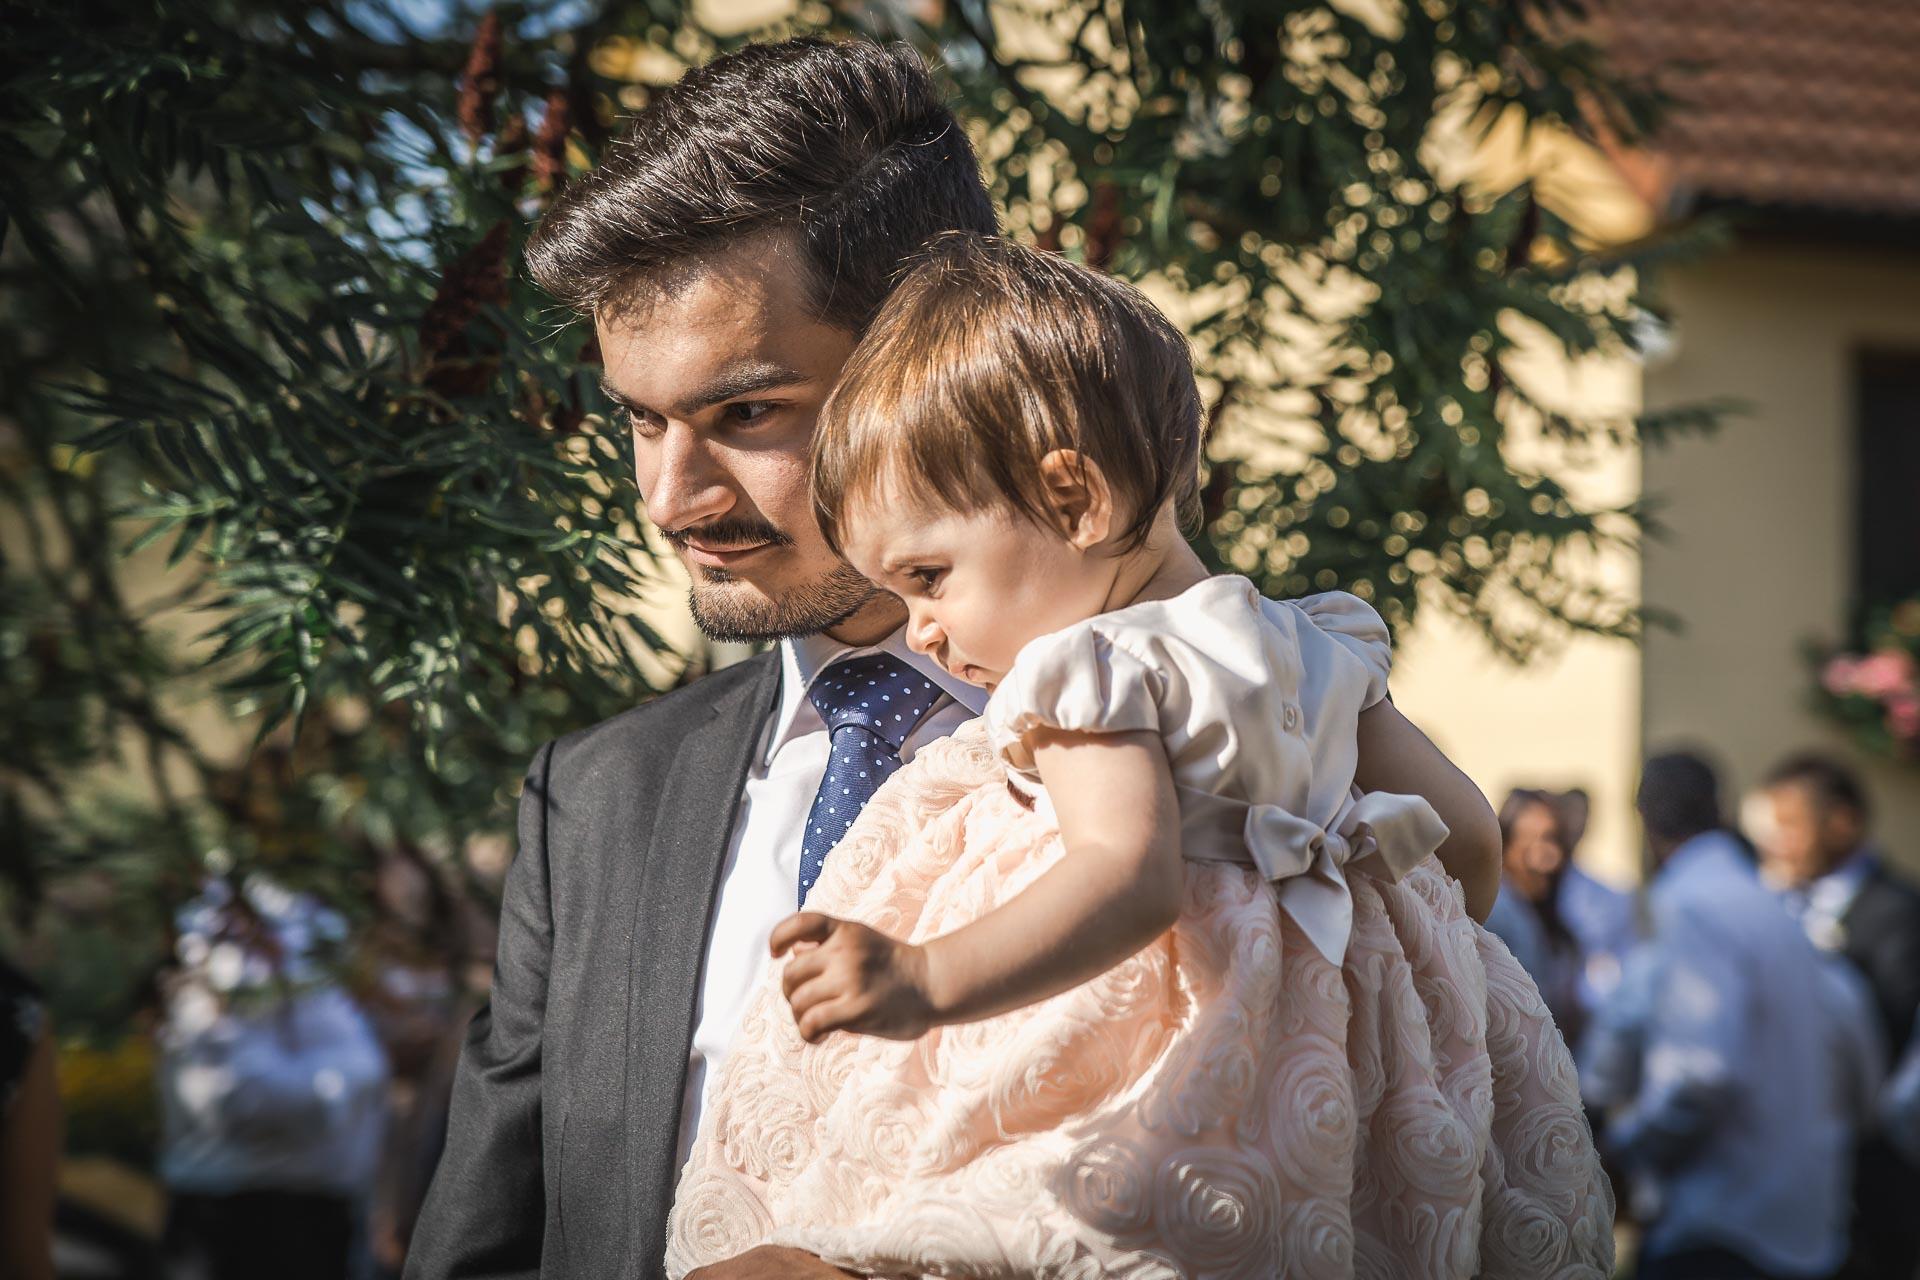 svatební-fotograf-wedding-svatebni-video-orlík-vltava-kostel-statek-stodola-boho-svatba-Beautyfoto-88